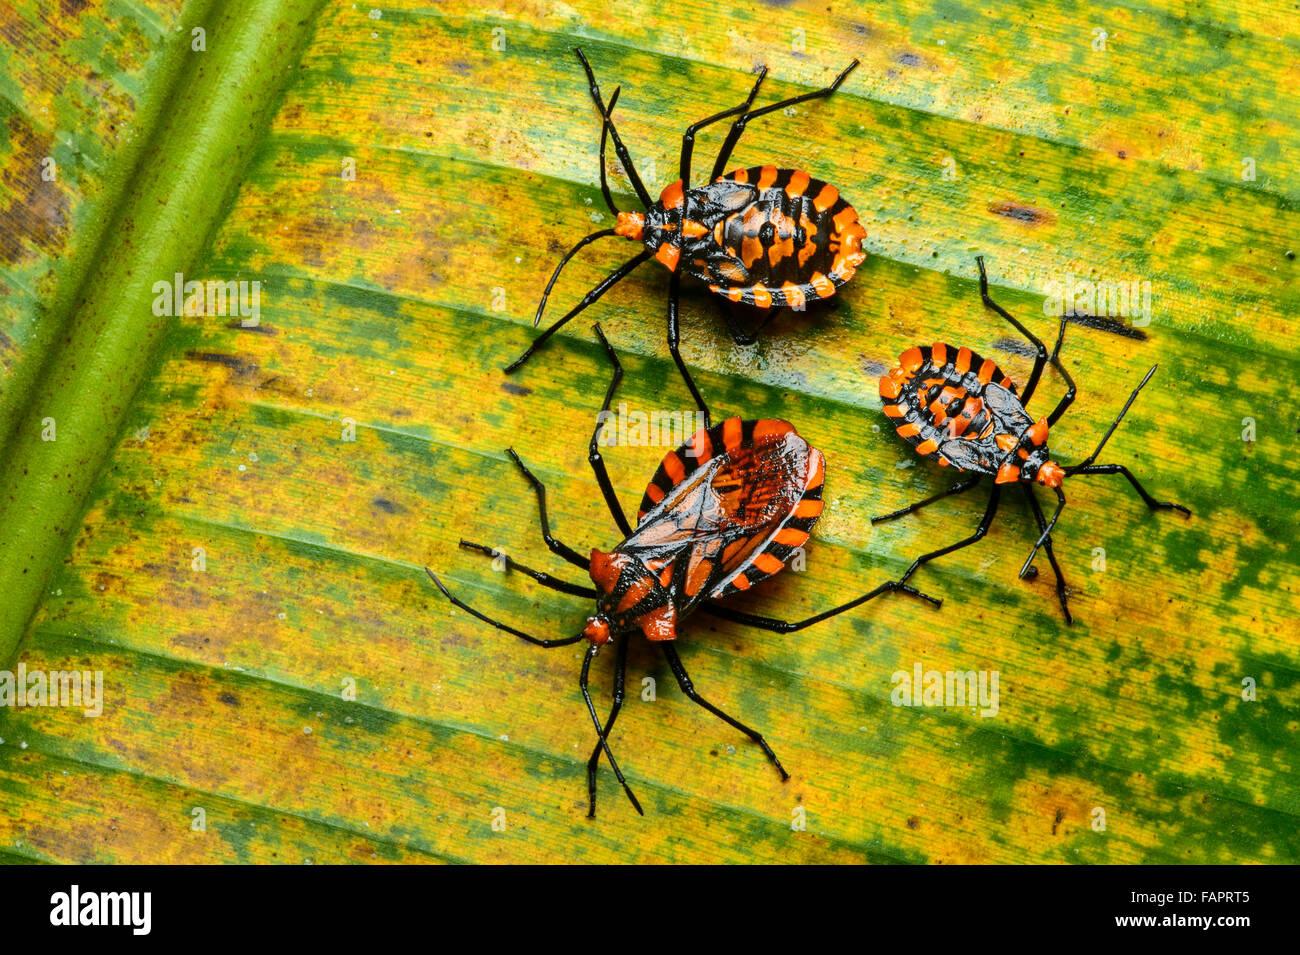 Coreidae (Coreidae) Nymphen und Imago, Anden Nebelwald, Mindo, Ecuador Stockbild